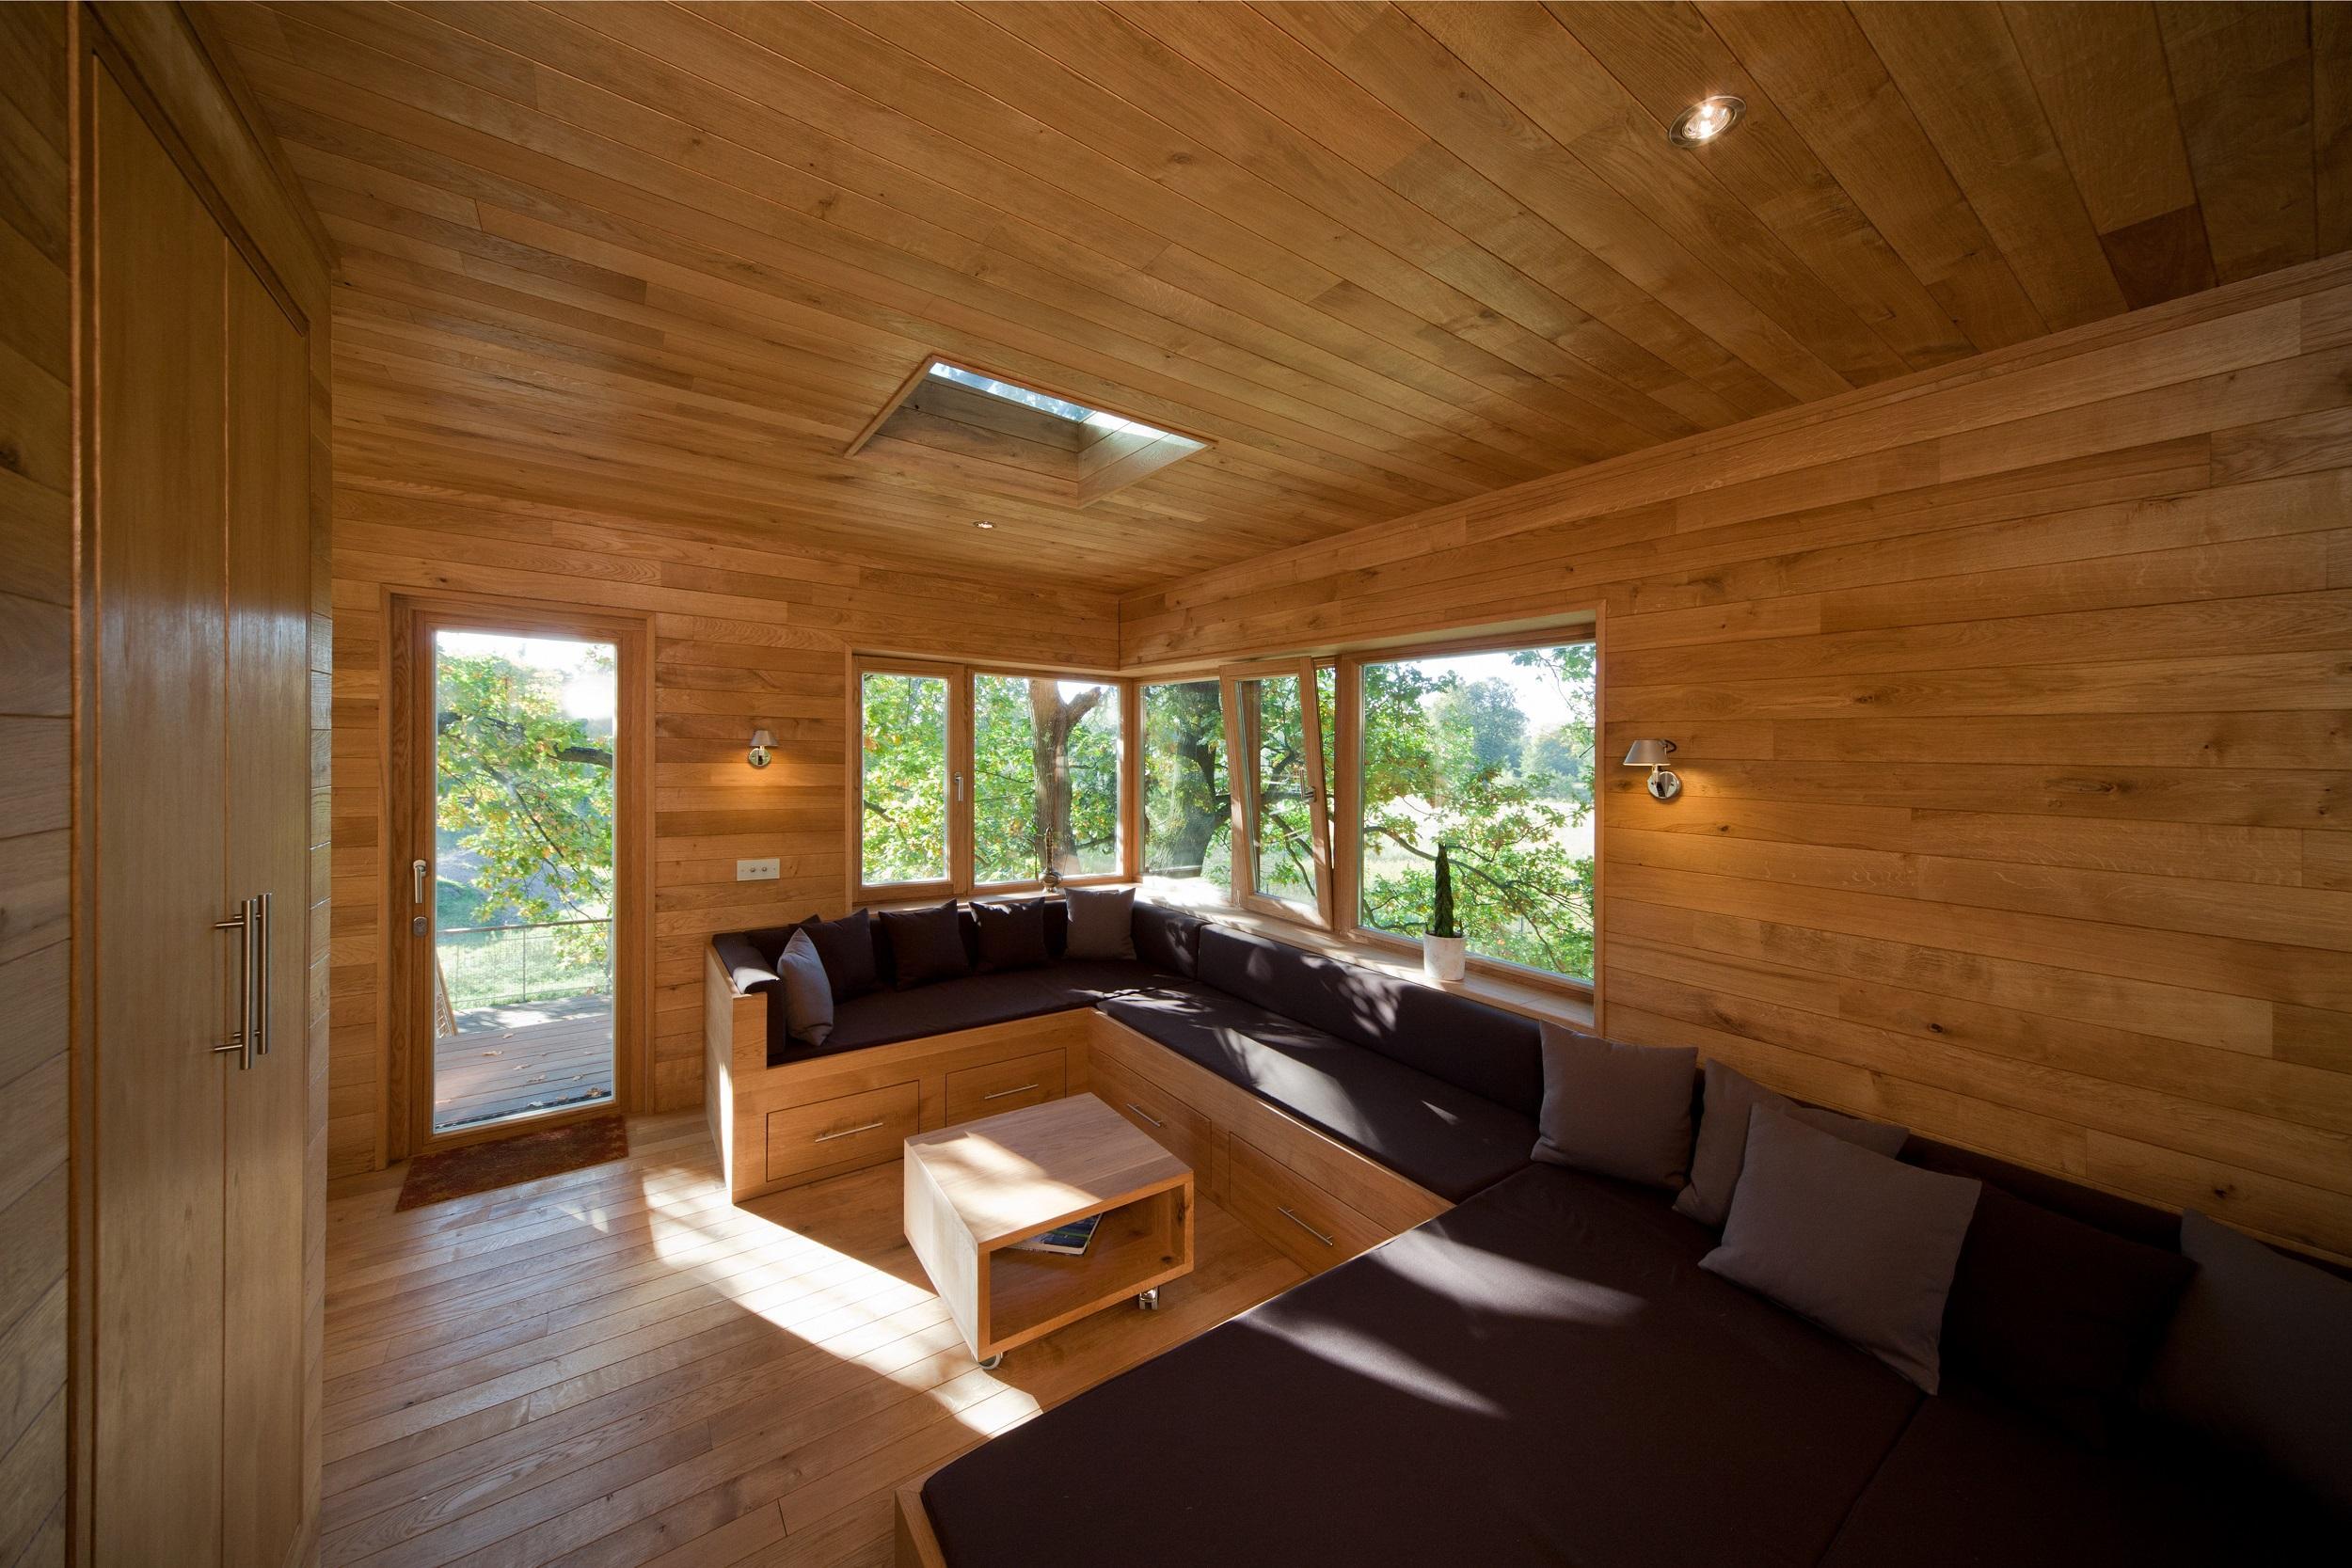 holzverkleidung bilder ideen couch. Black Bedroom Furniture Sets. Home Design Ideas